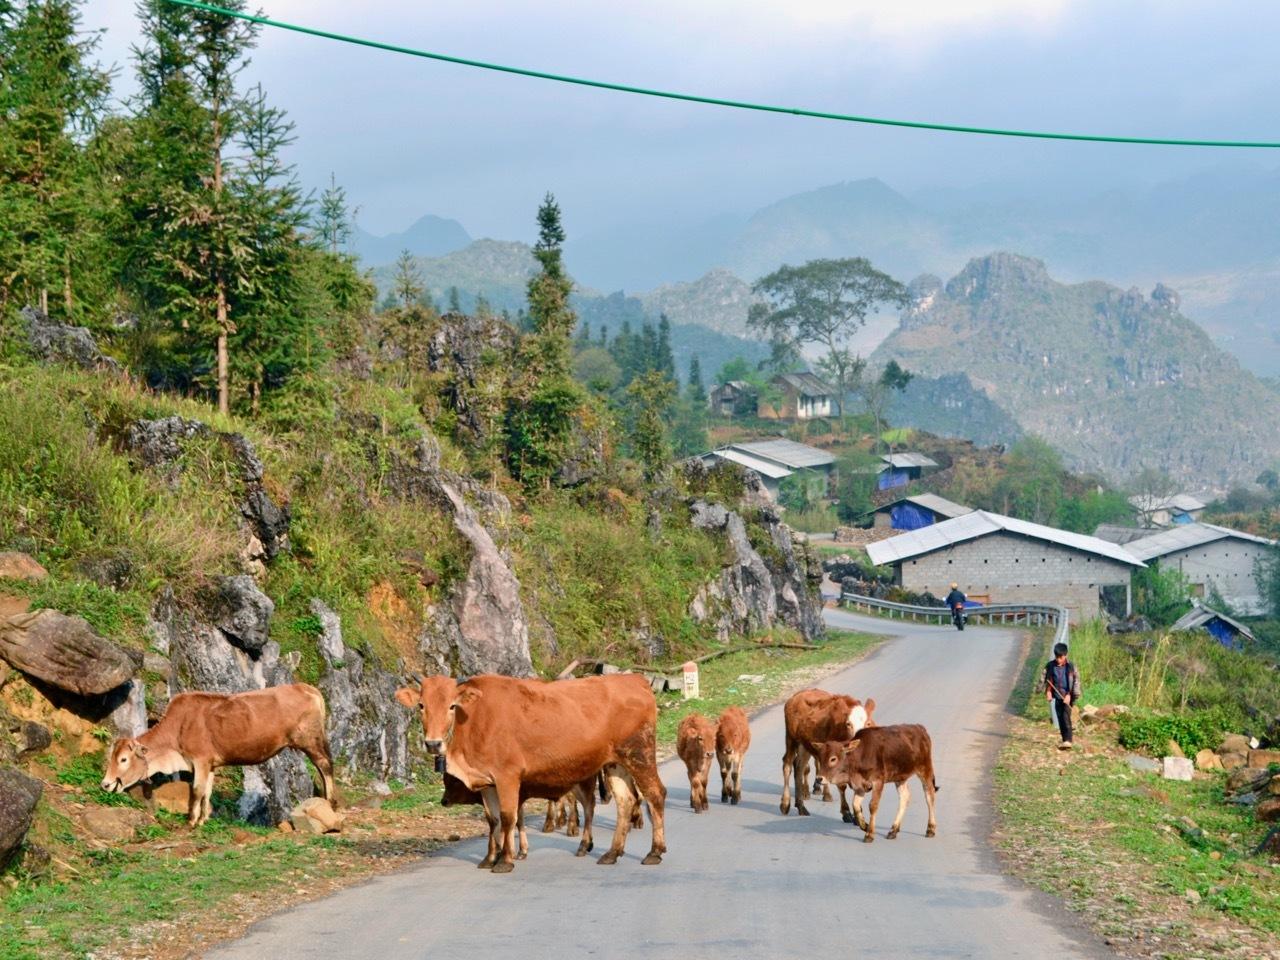 Meo Vac Village